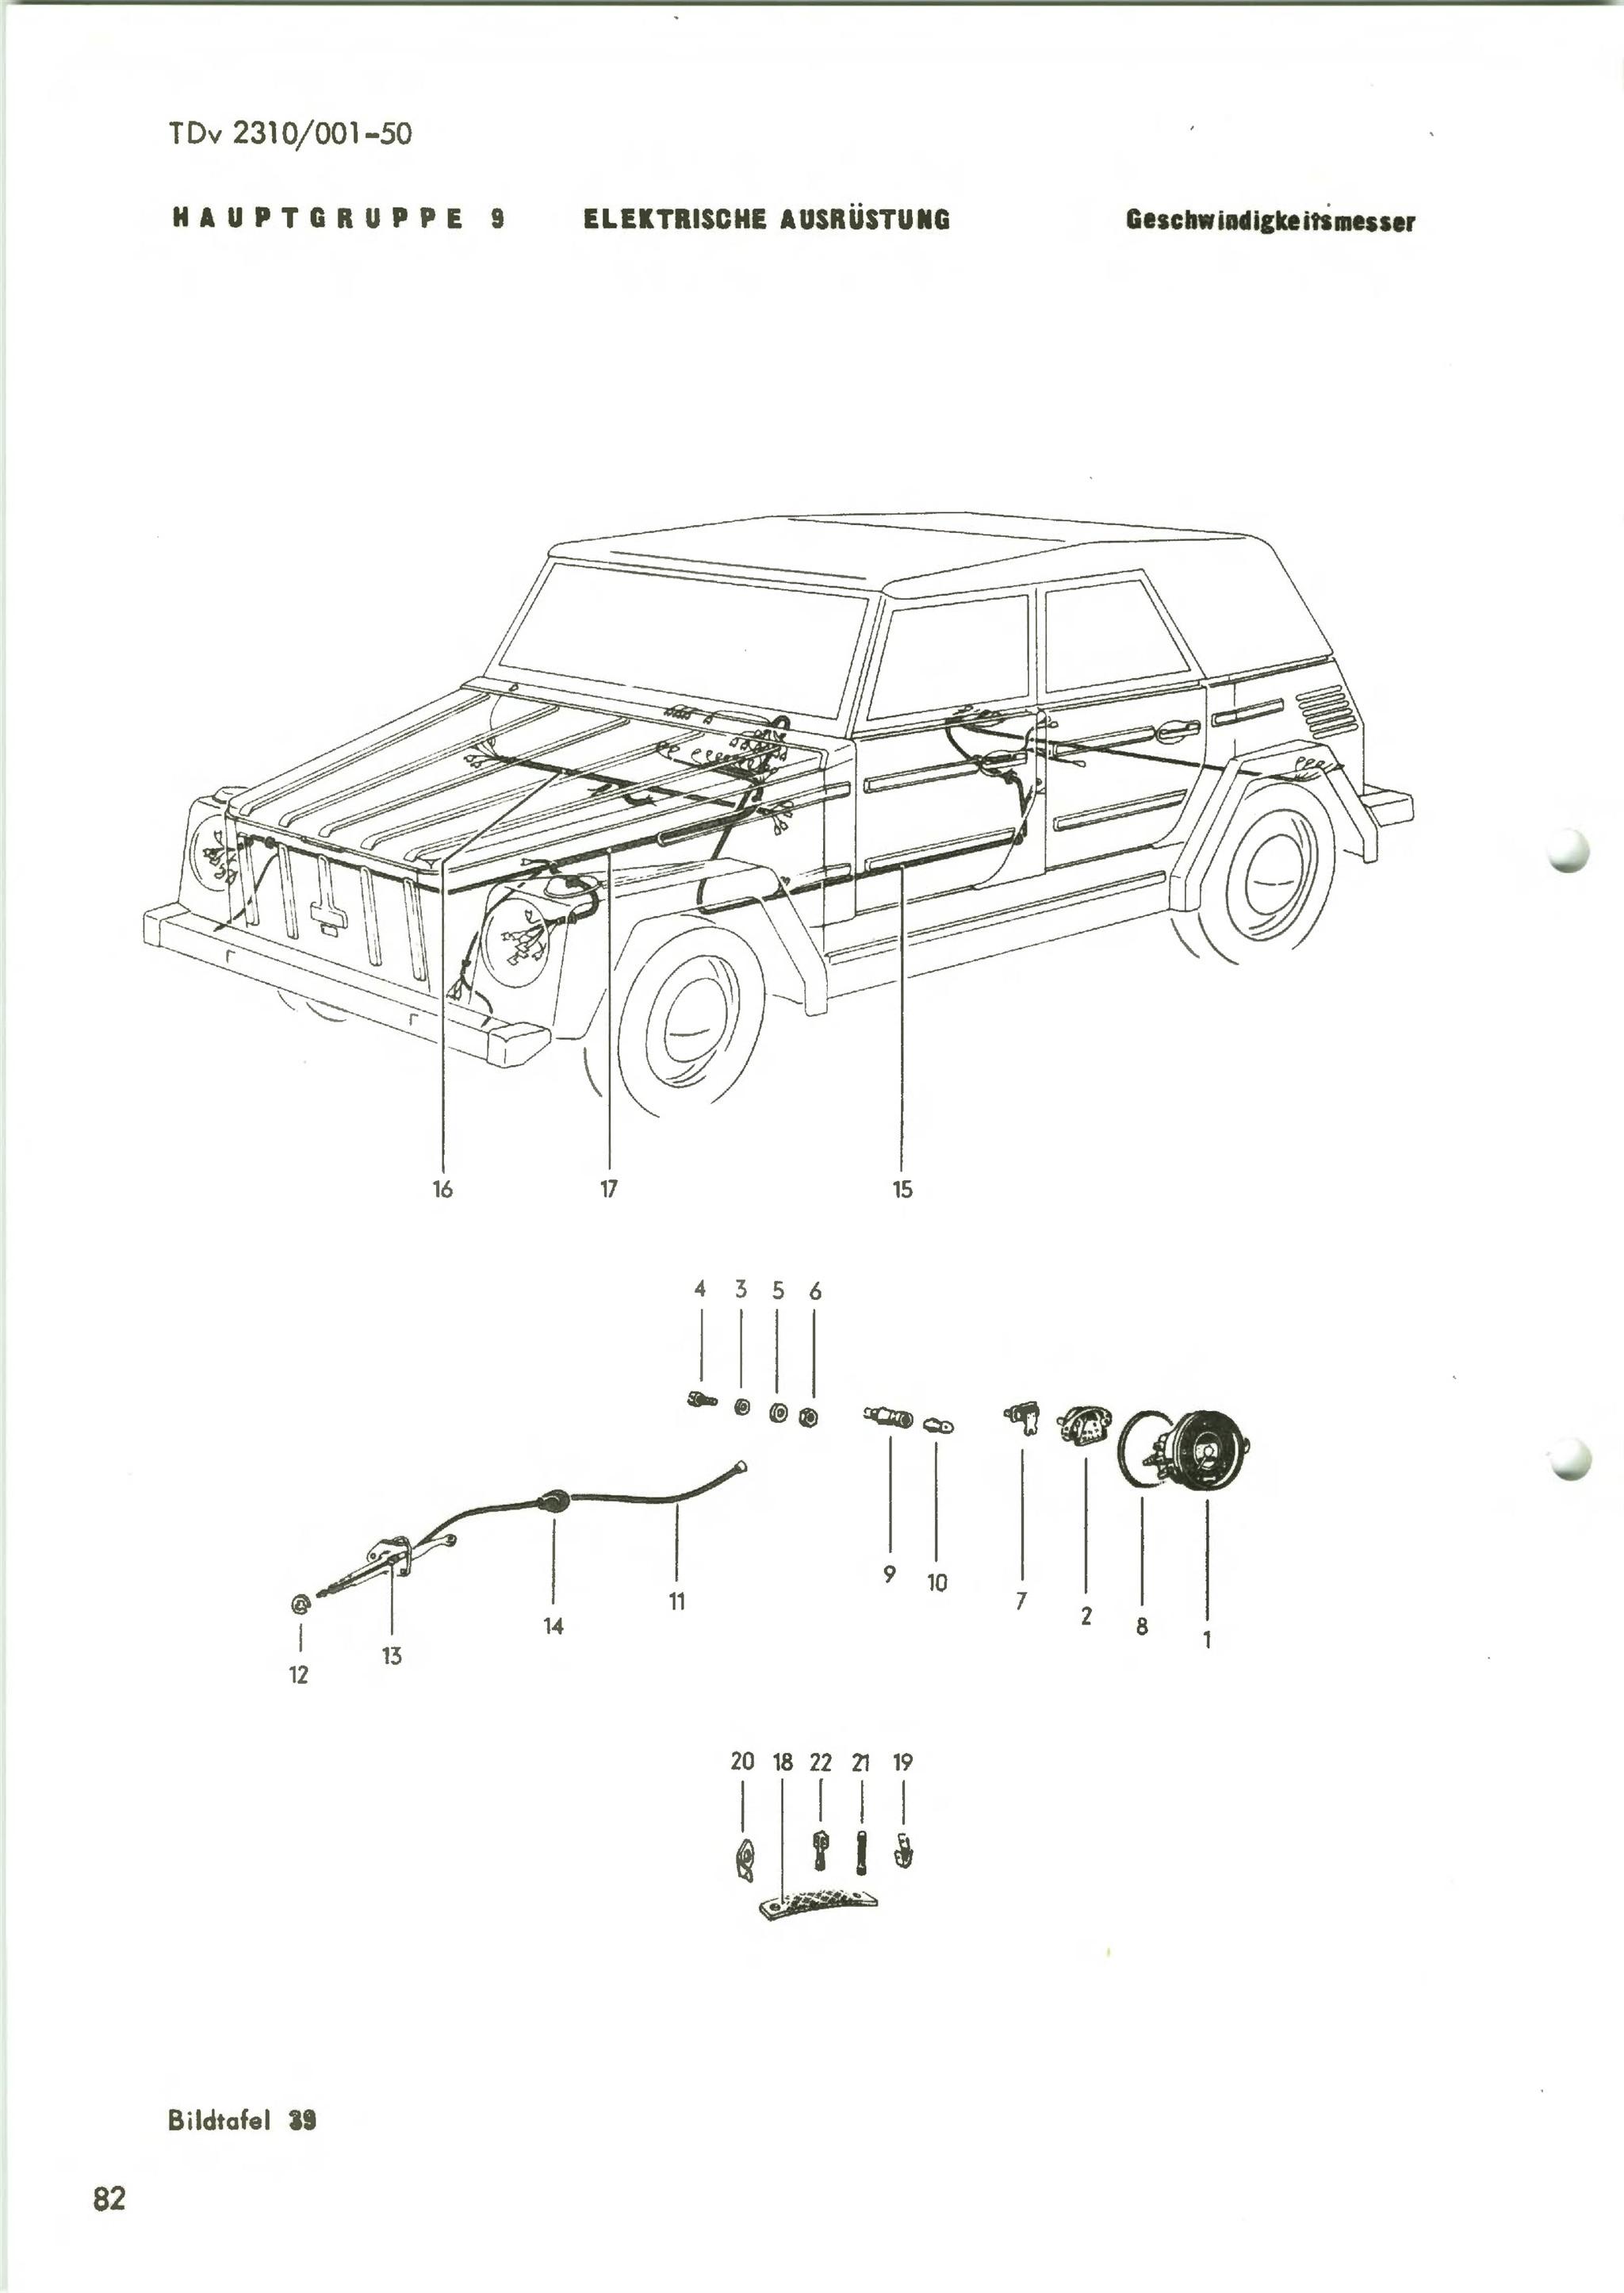 1991 vw cabriolet wiring diagram